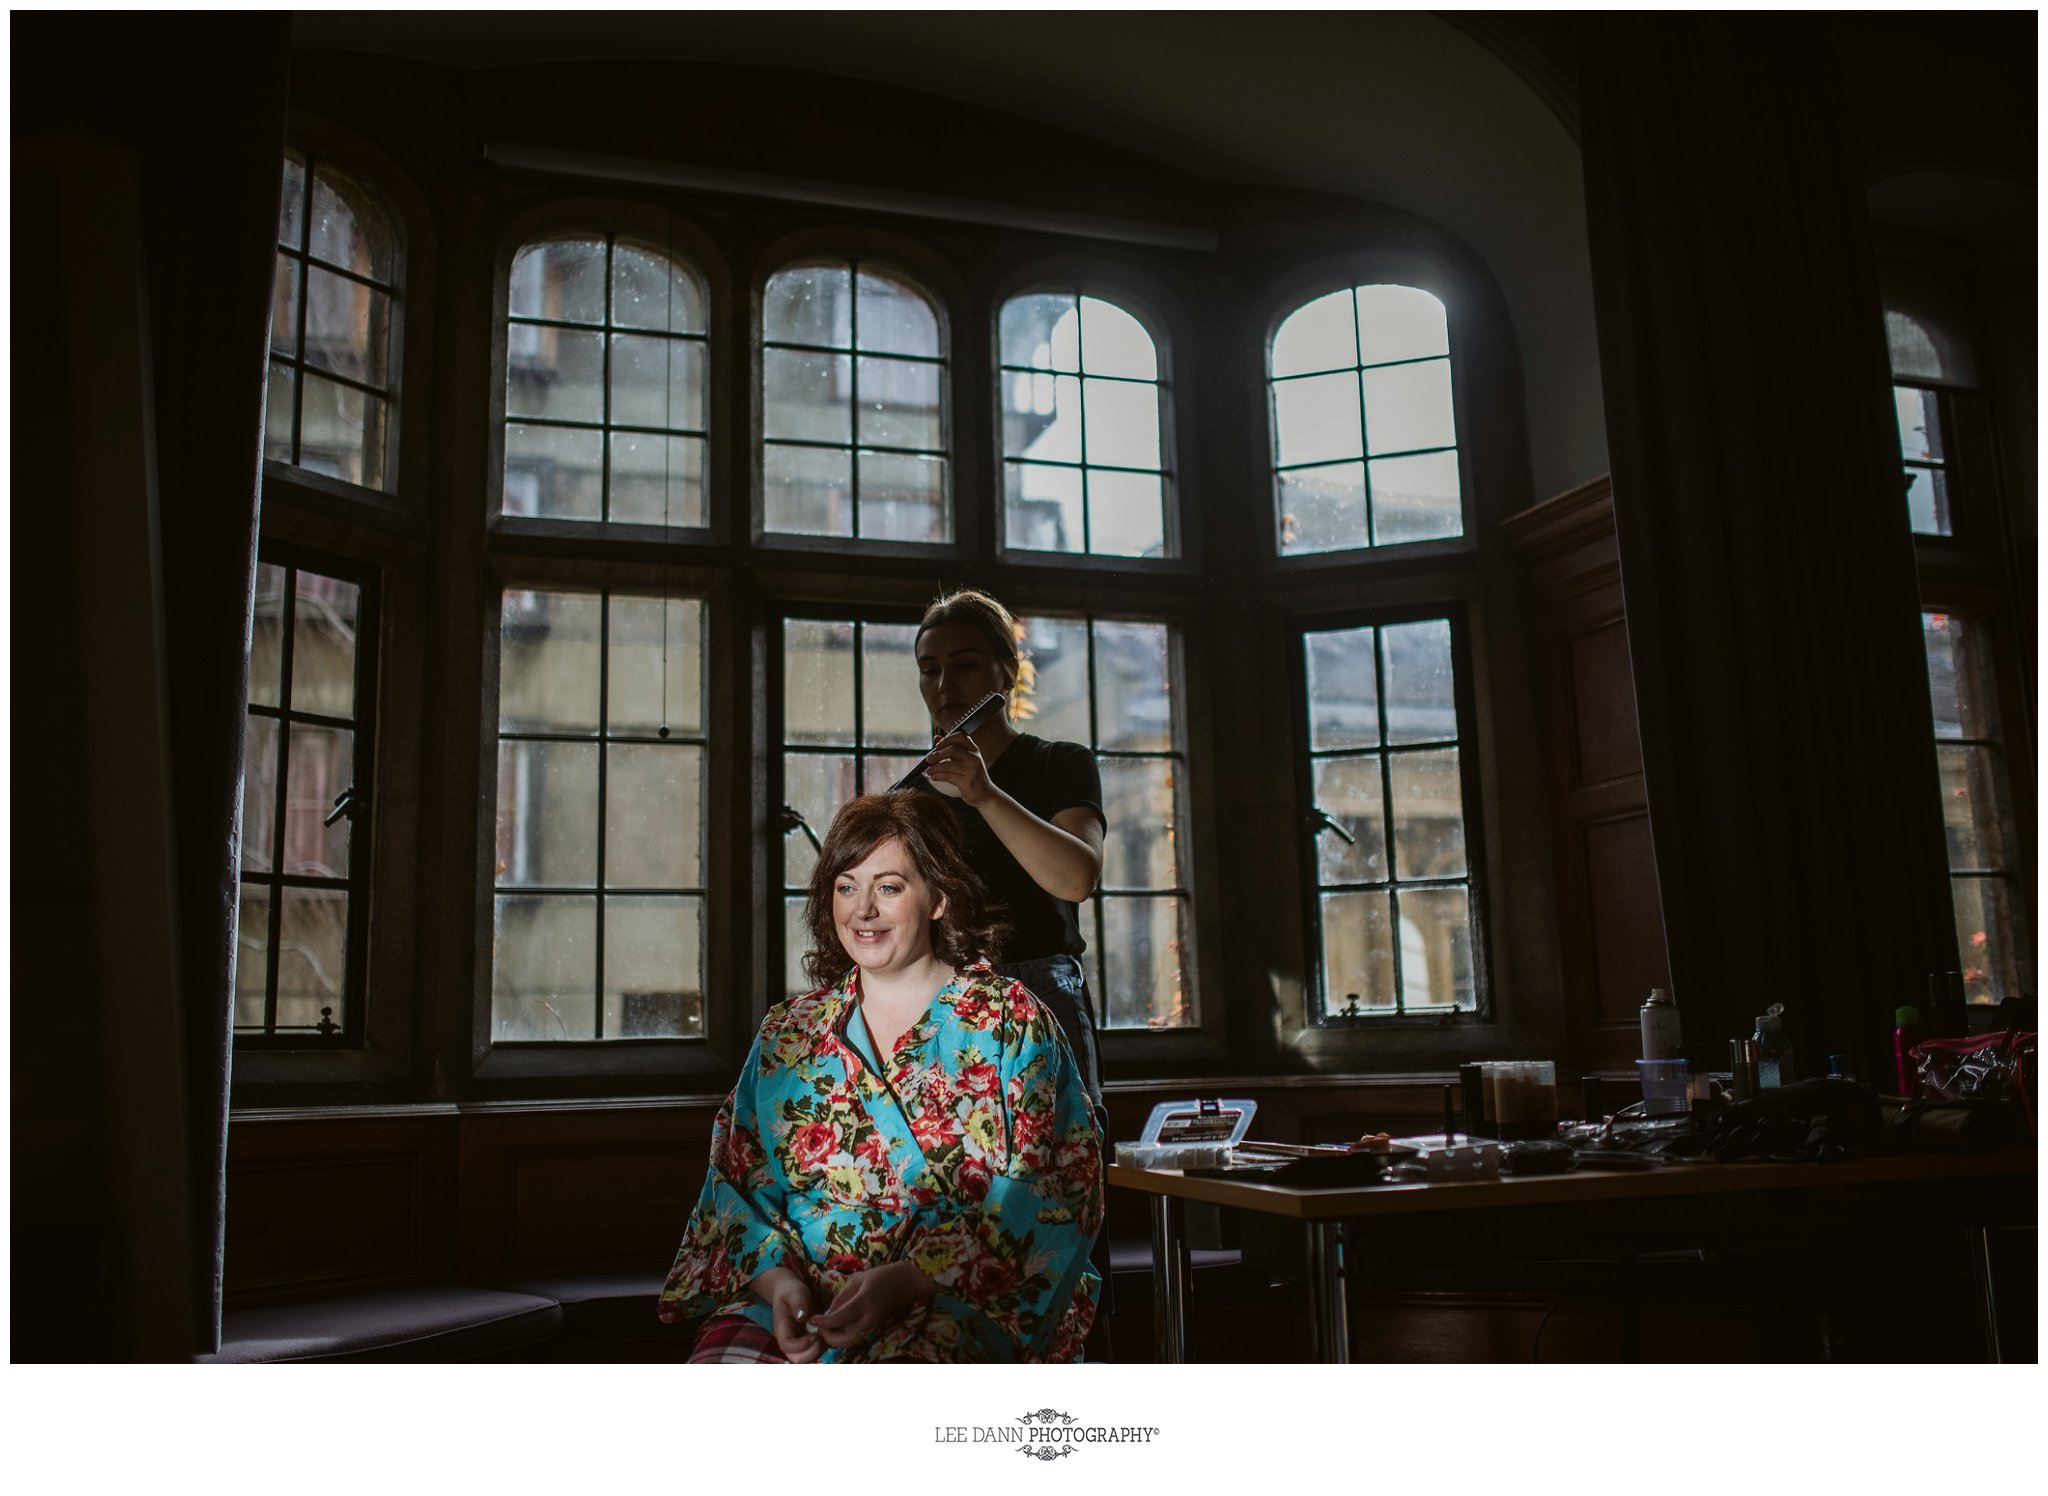 Kathryn&Christopherwedding-TrinityCollege-1stApril2017-1032